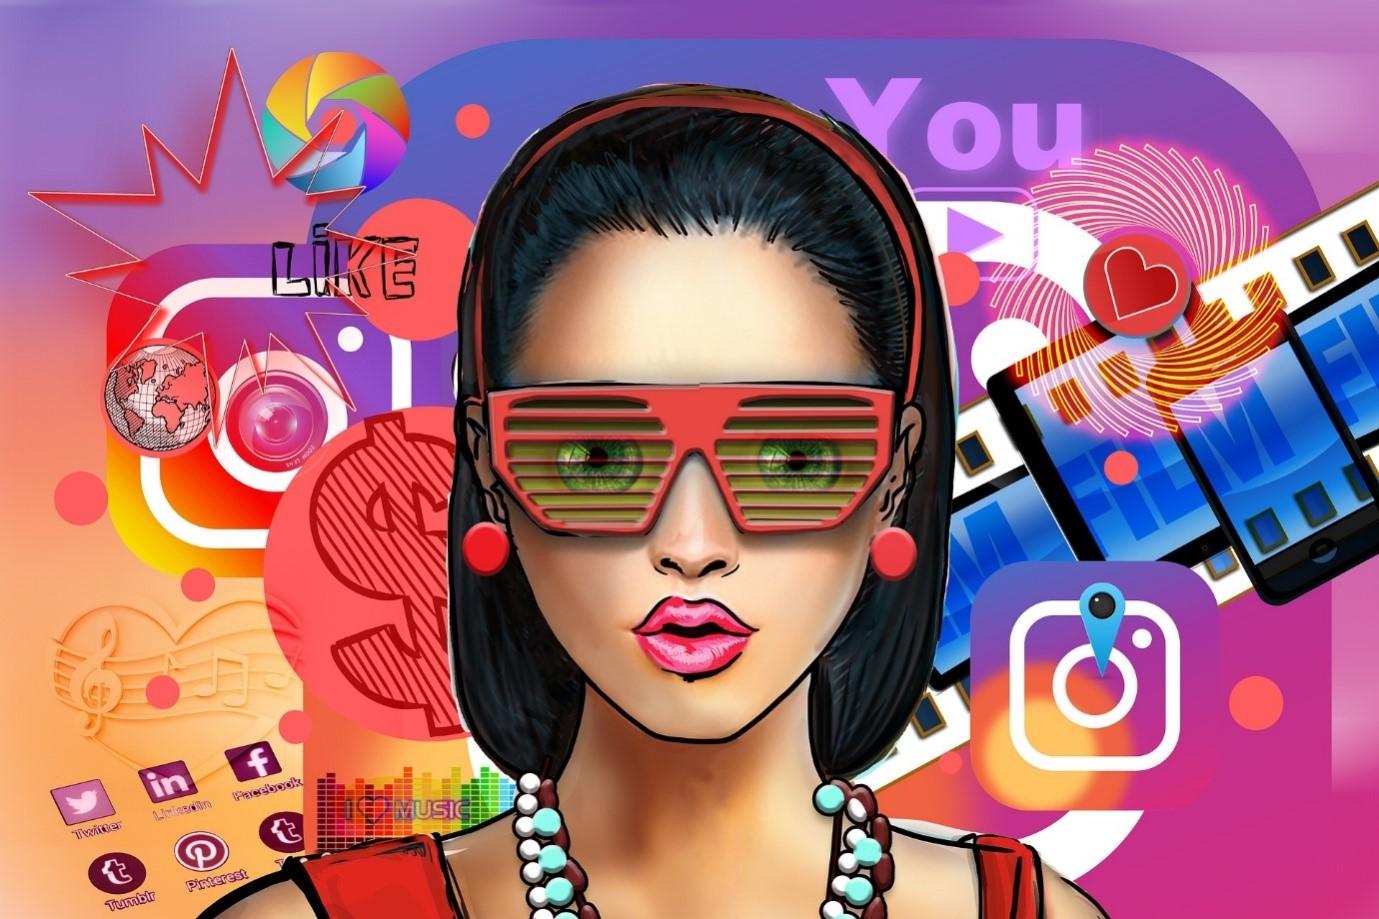 Top 8 Tips from Top Instagram Influencers